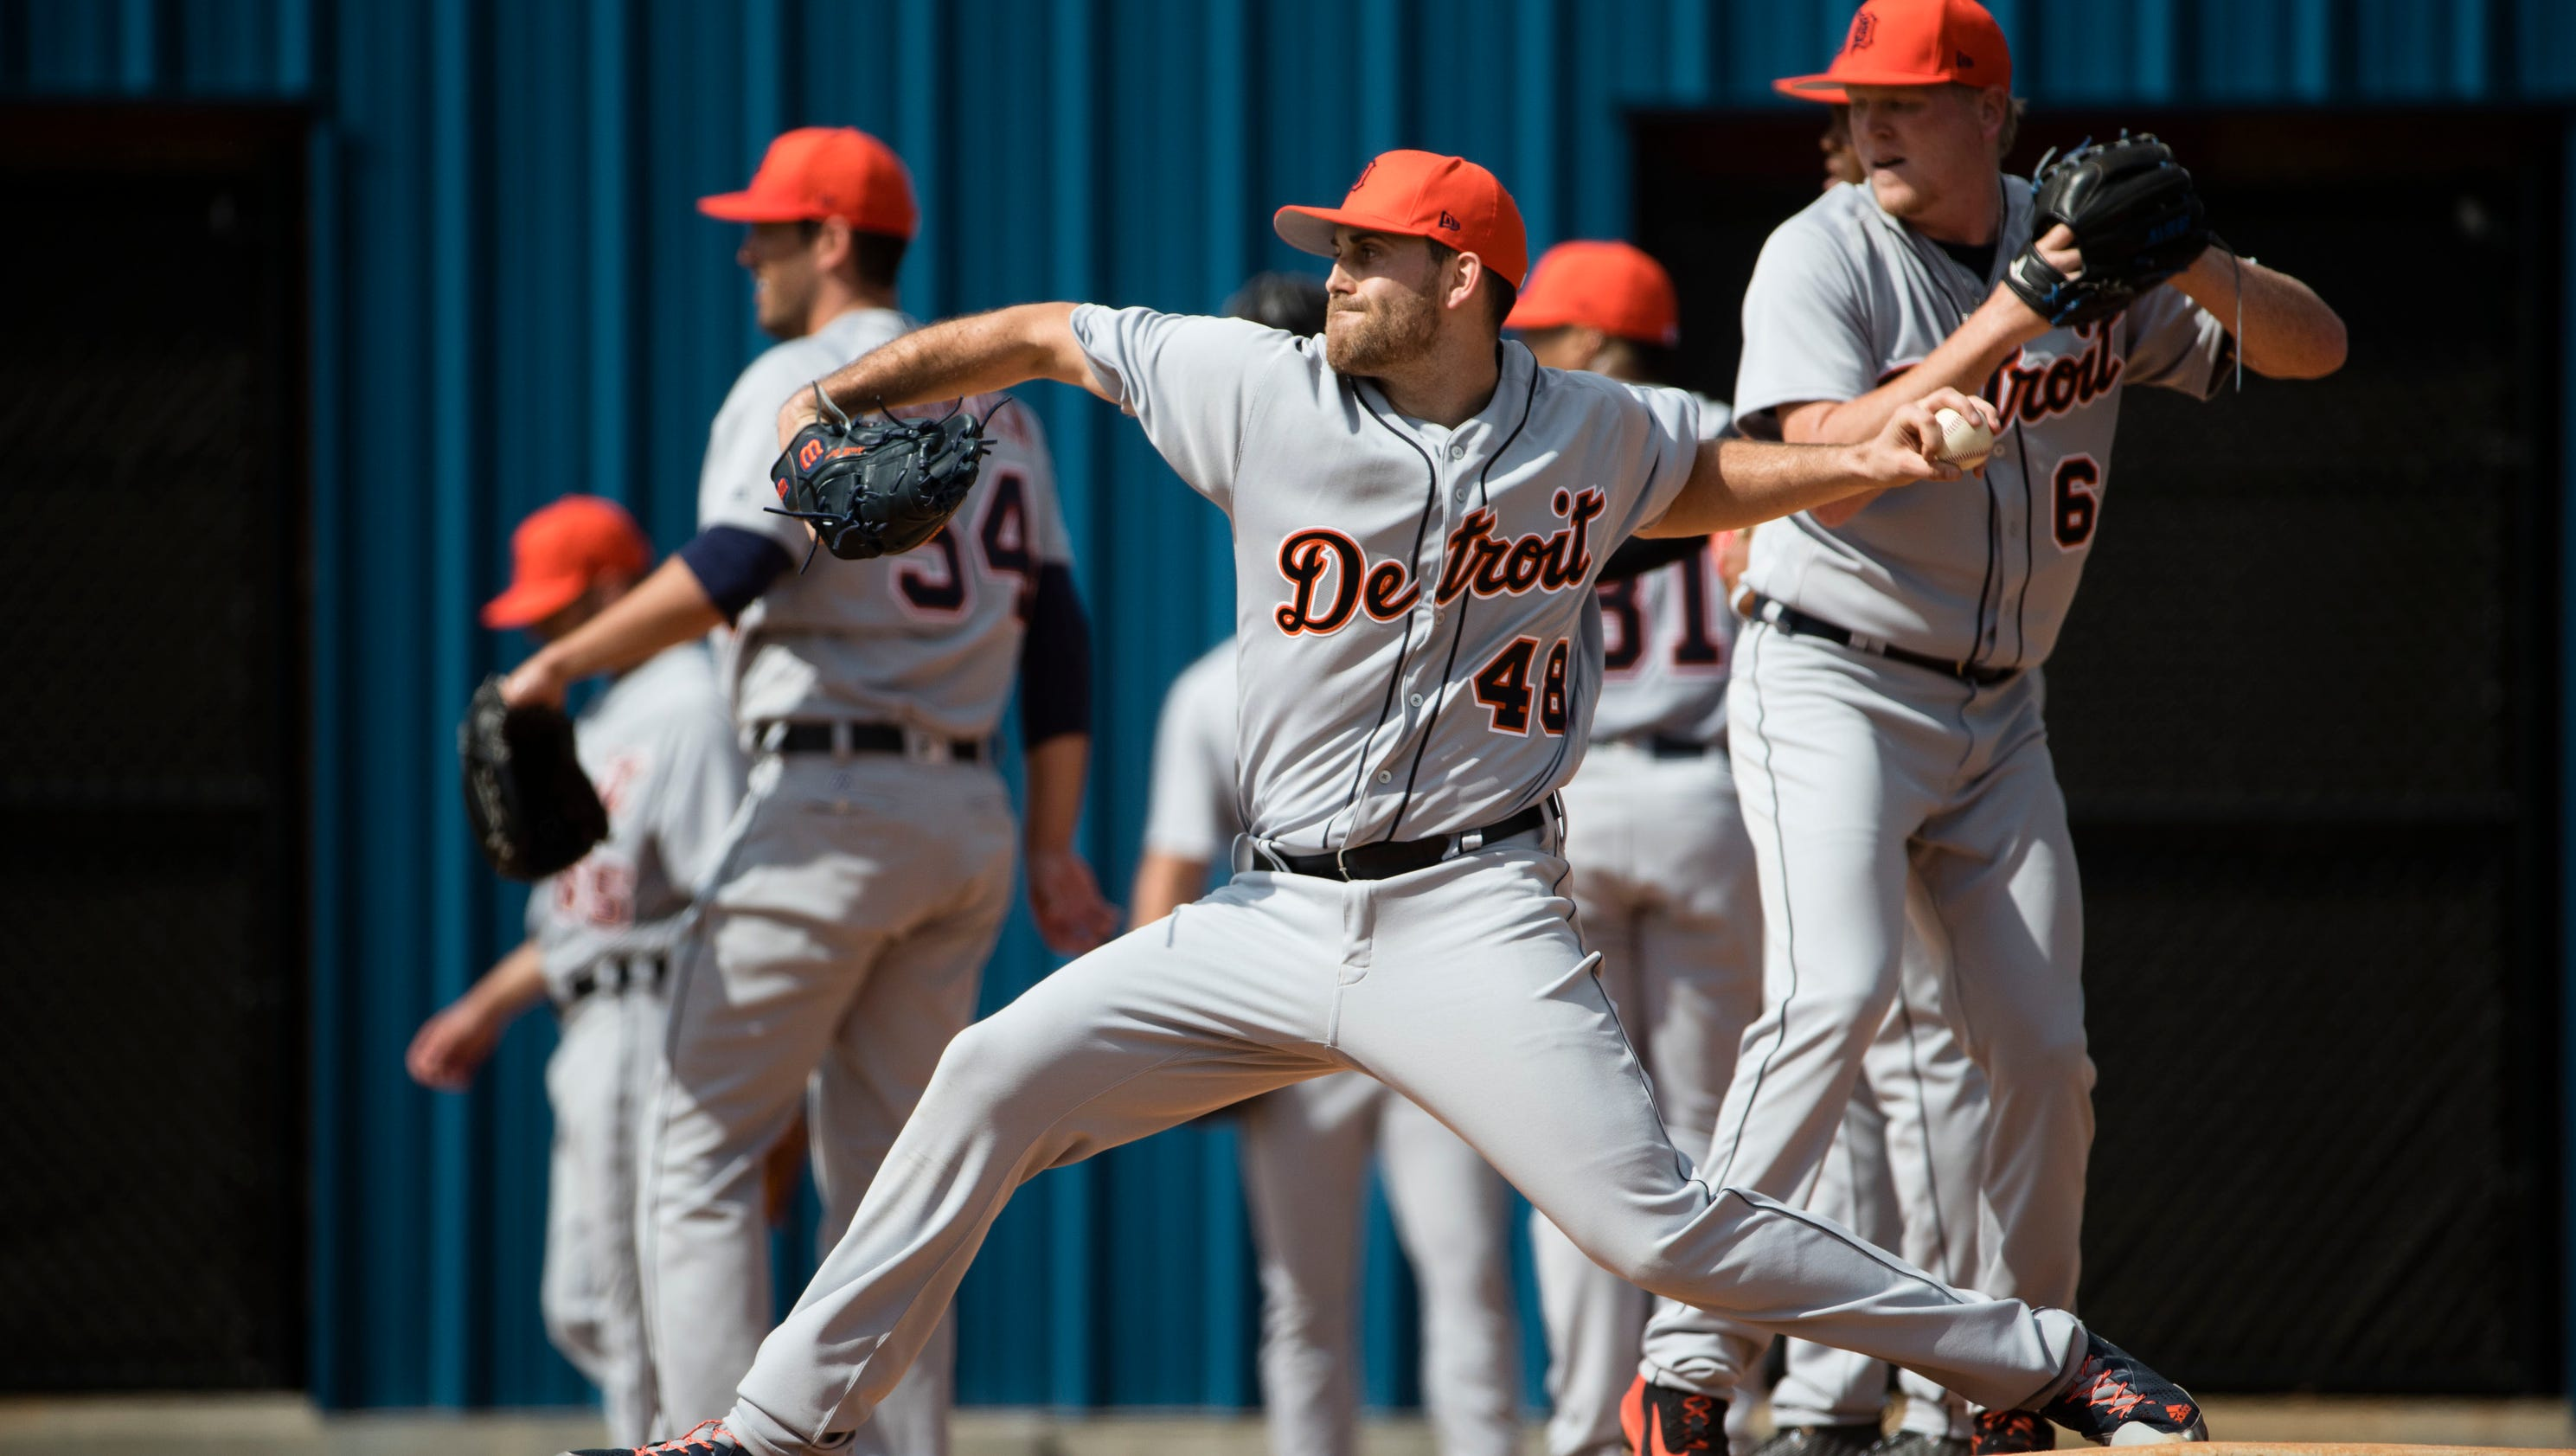 636237275861760708-ap-tigers-spring-baseball-fl